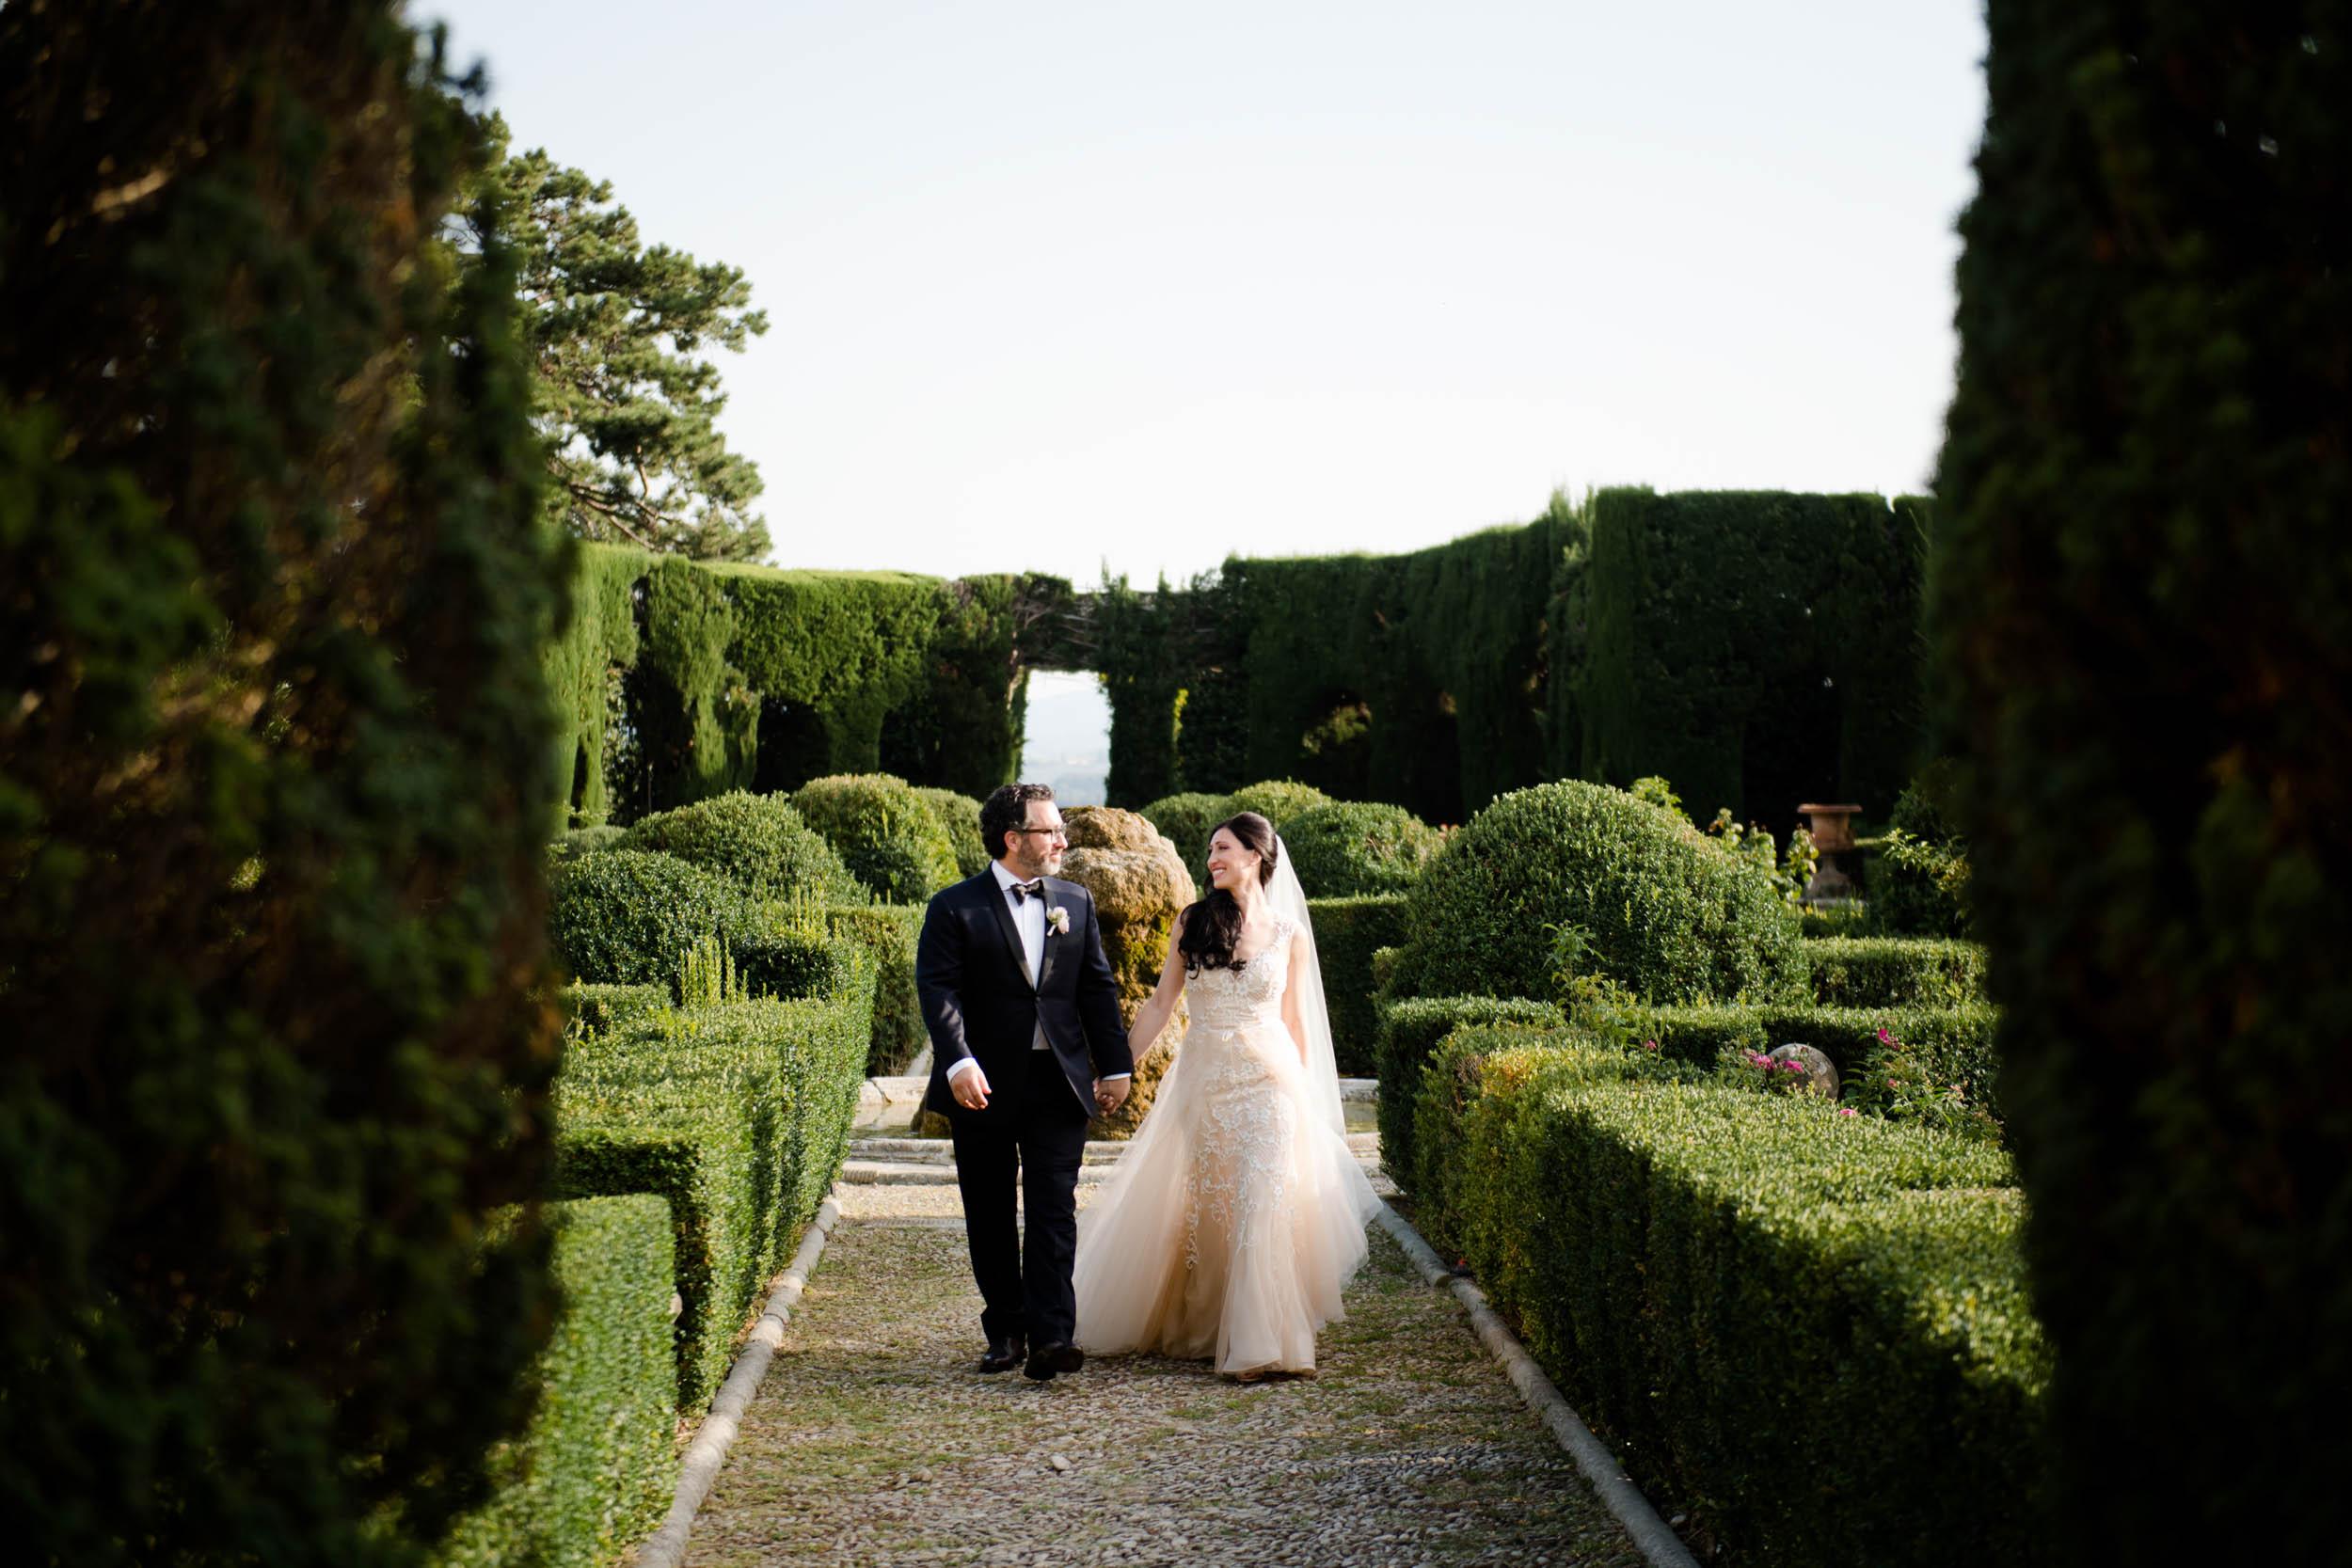 villa-gamberaia-florence-italy-destination-wedding-54.jpg